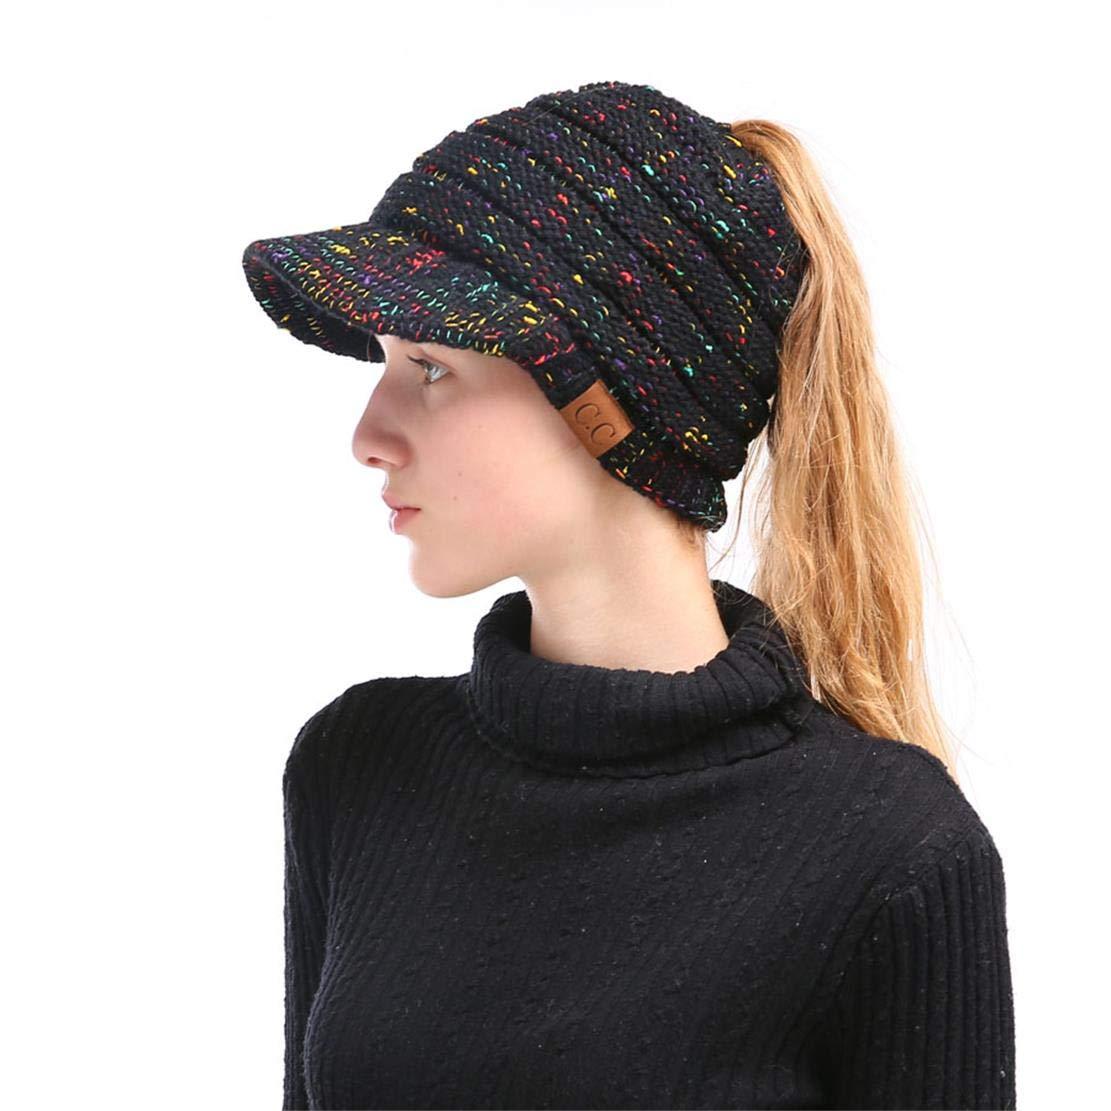 Women's Soft Winter Knitted Hat Visor Brim Warm Beanie Tail Cold Weather Baseball Cap by PiePieBuy